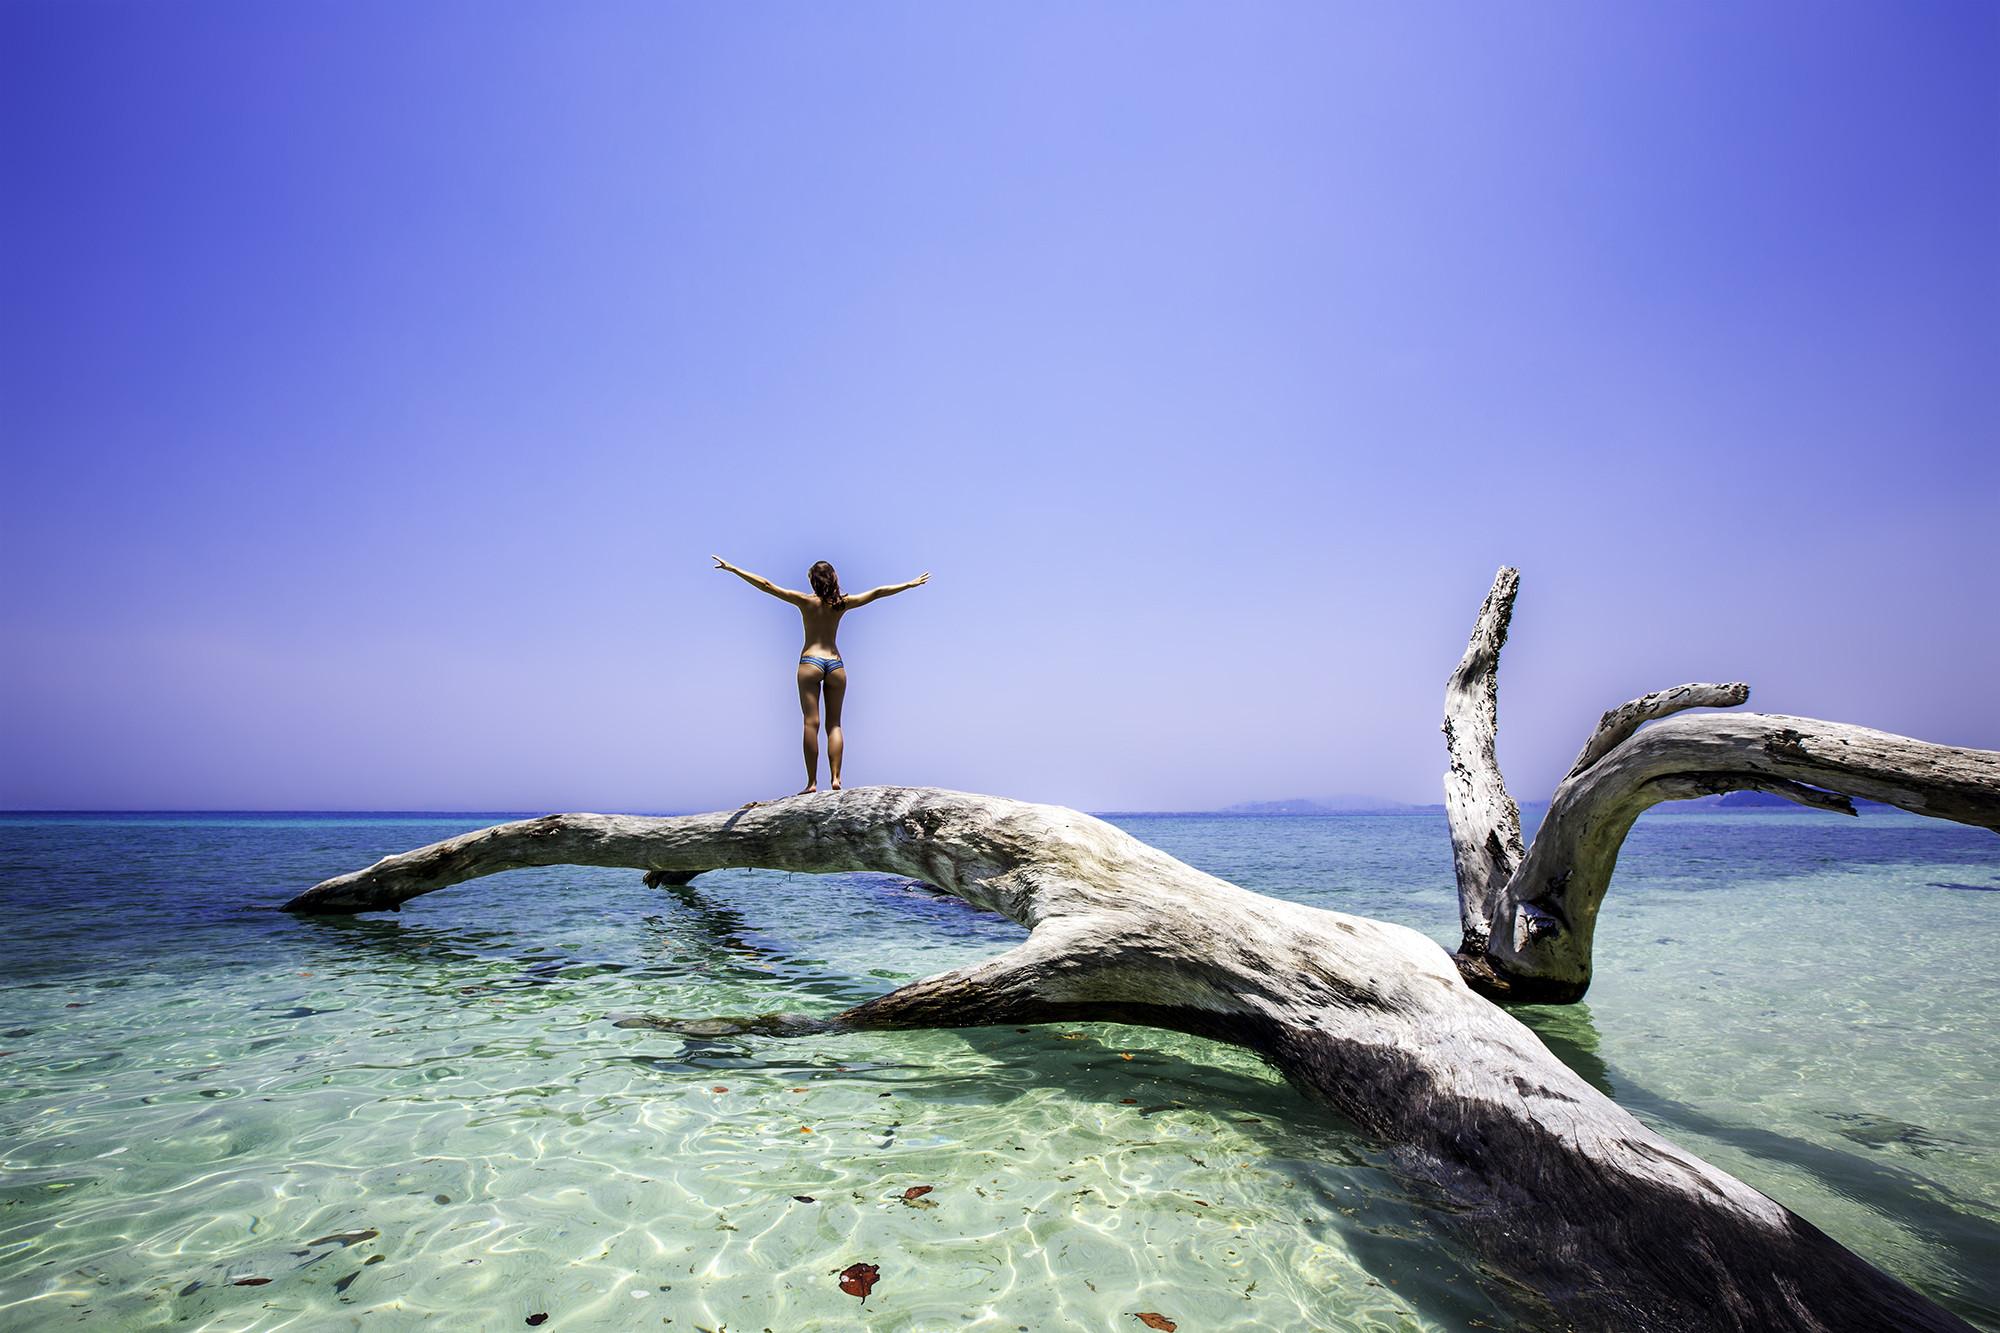 обои море, коряга, девушка, пейзаж картинки фото